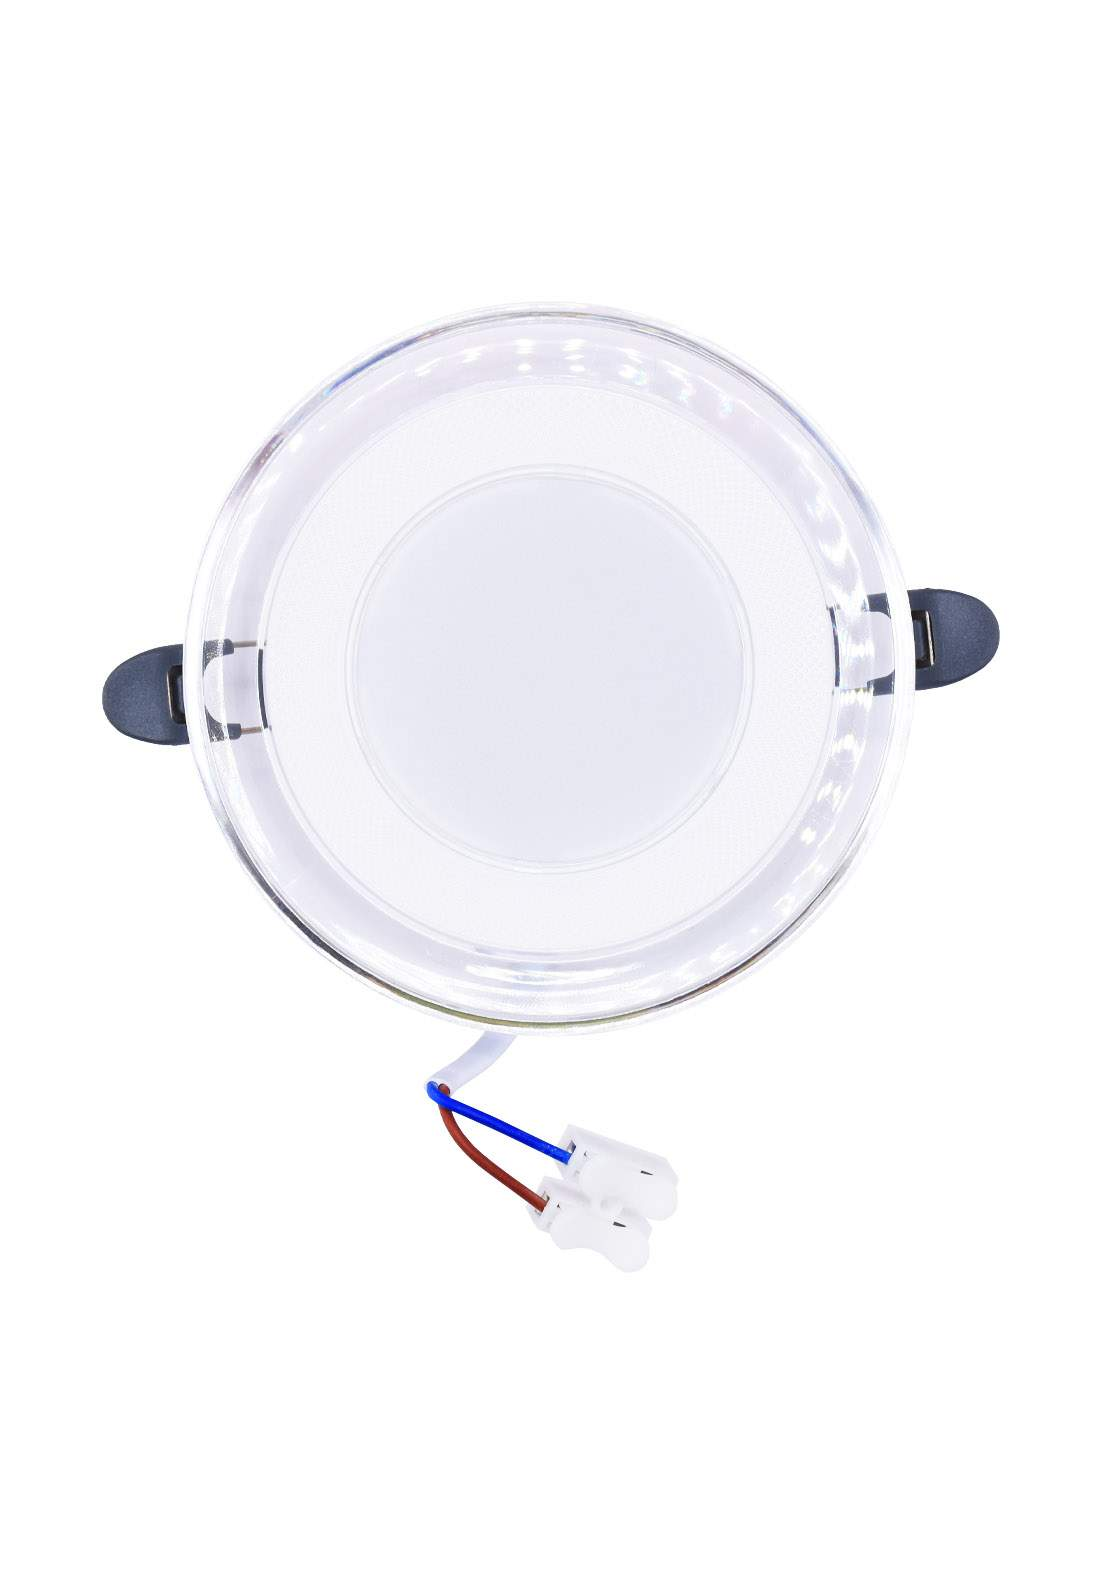 Raja LED SMD Downlight Slim Three Color Change 5 W ضوء ليد دائري زجاجي